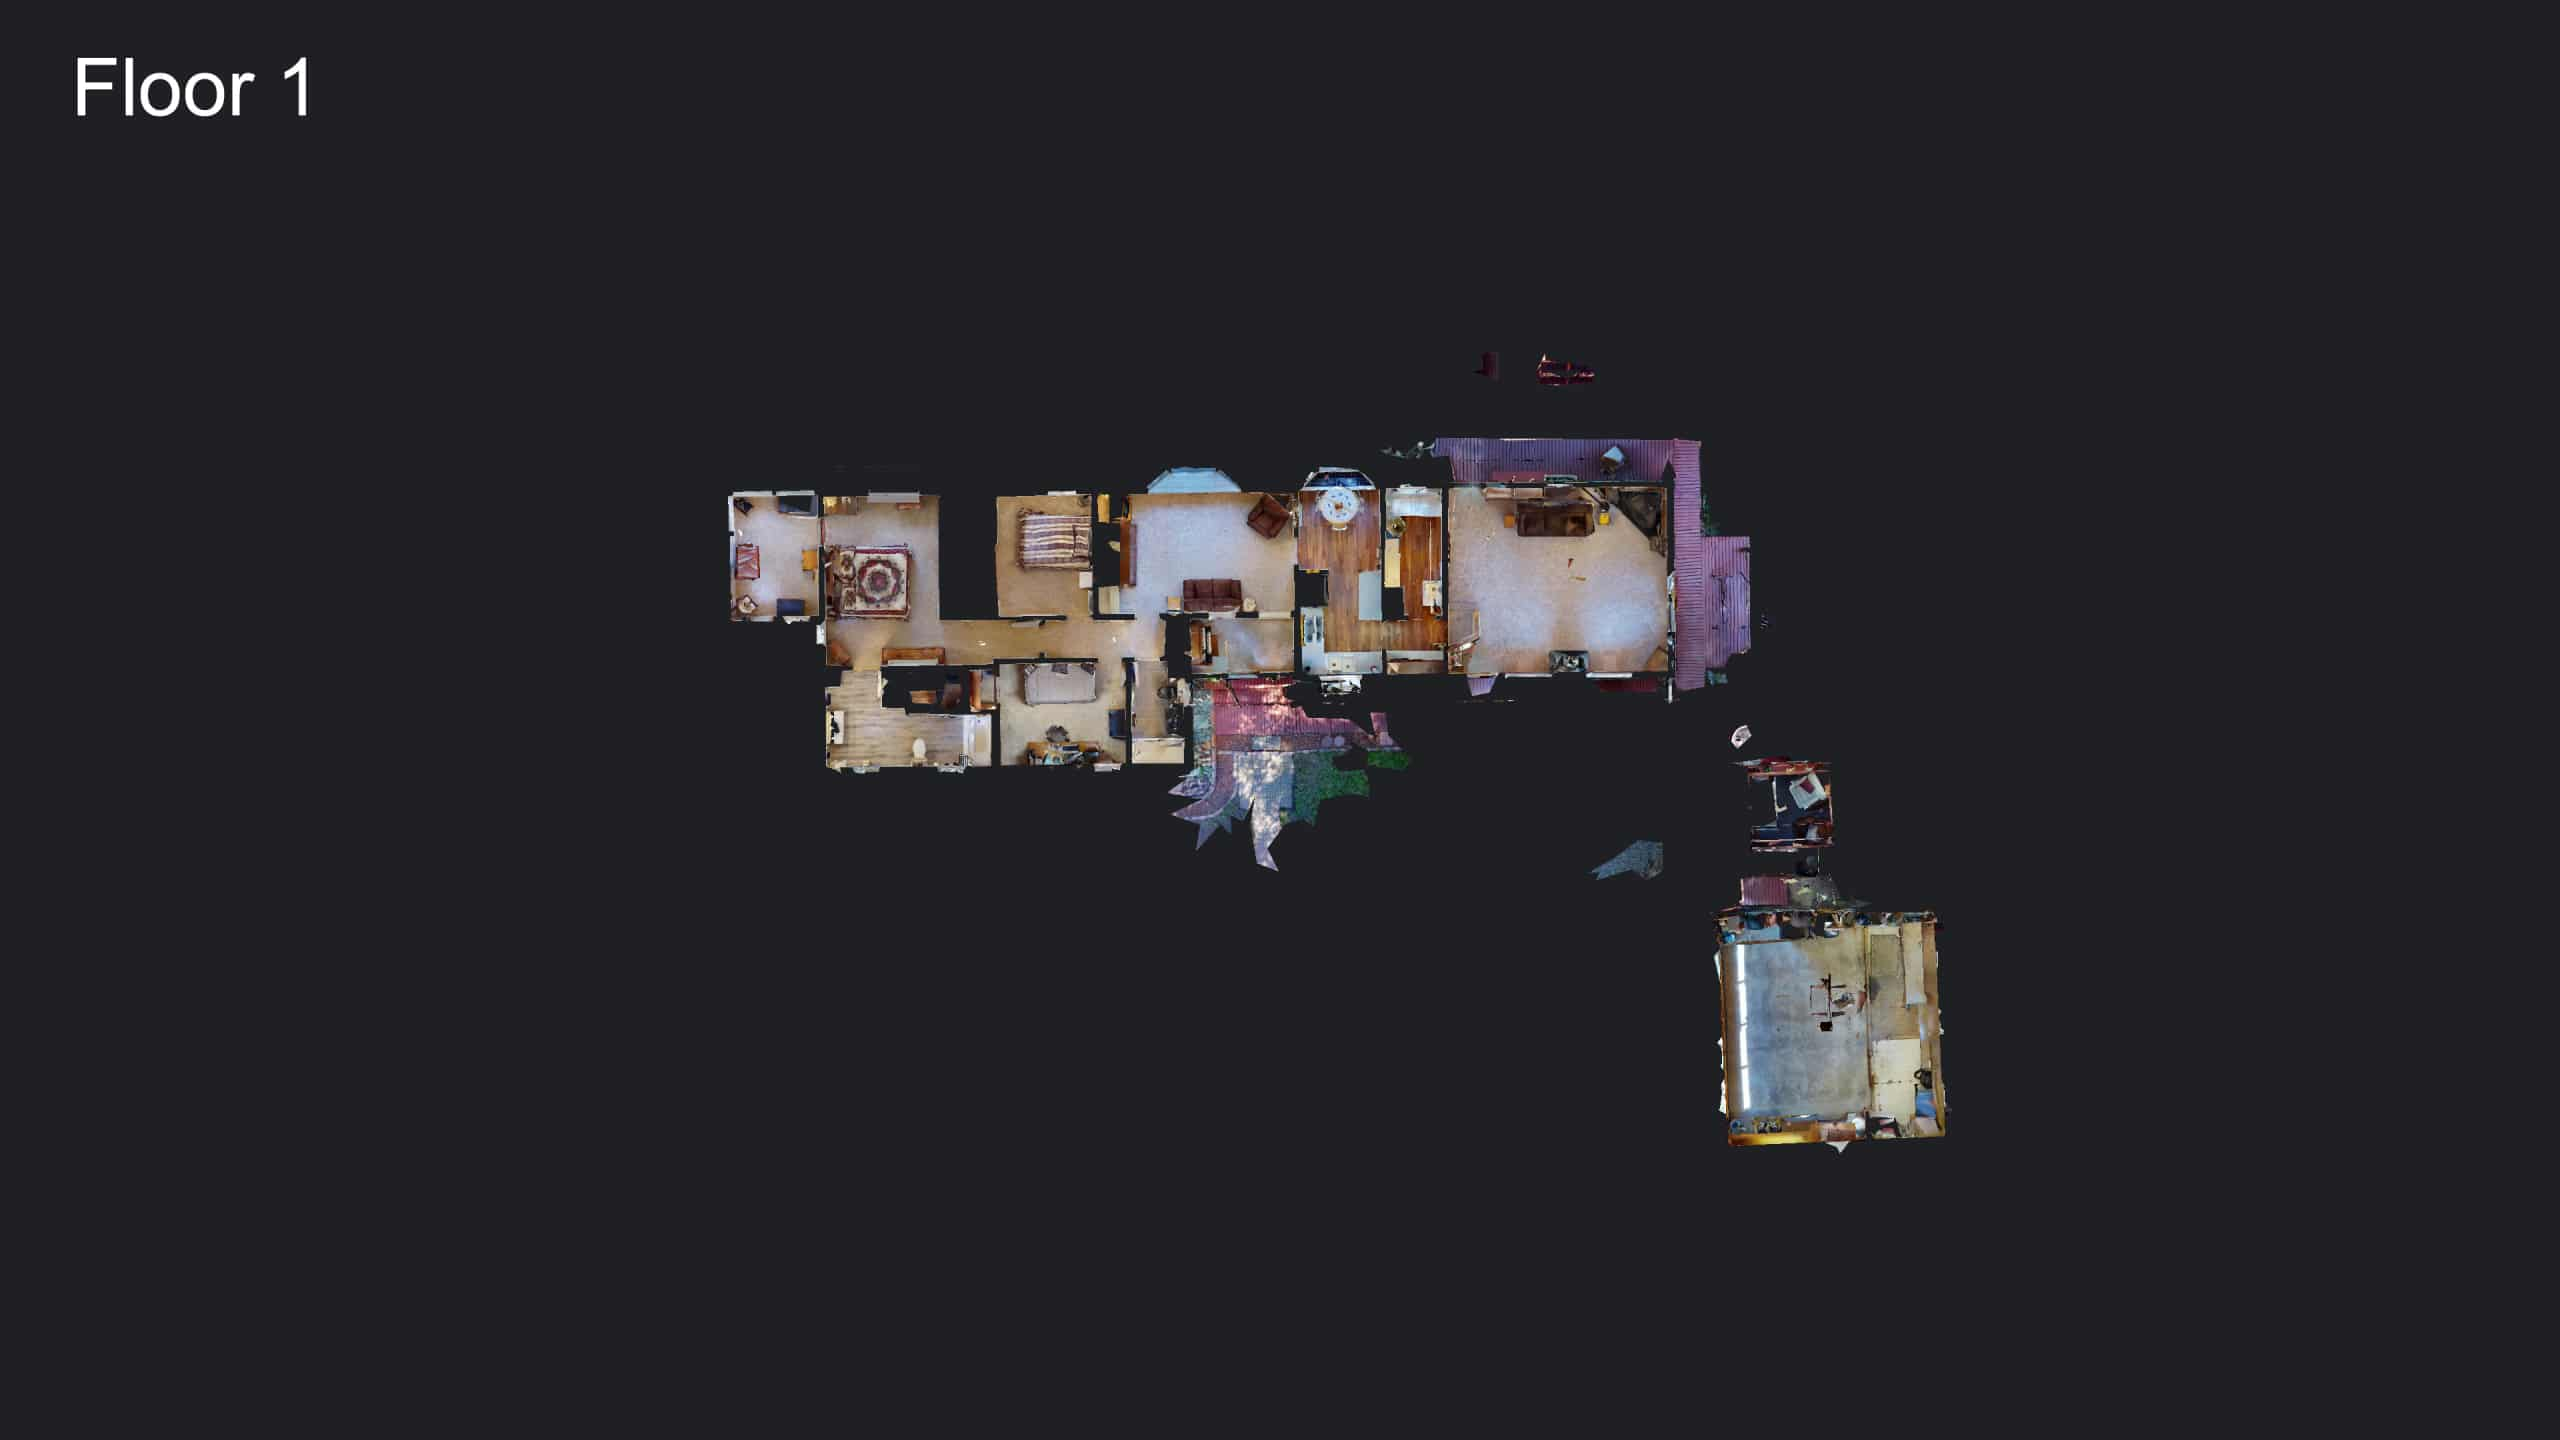 Evergreen Home for Sale 3D floor Plan Design